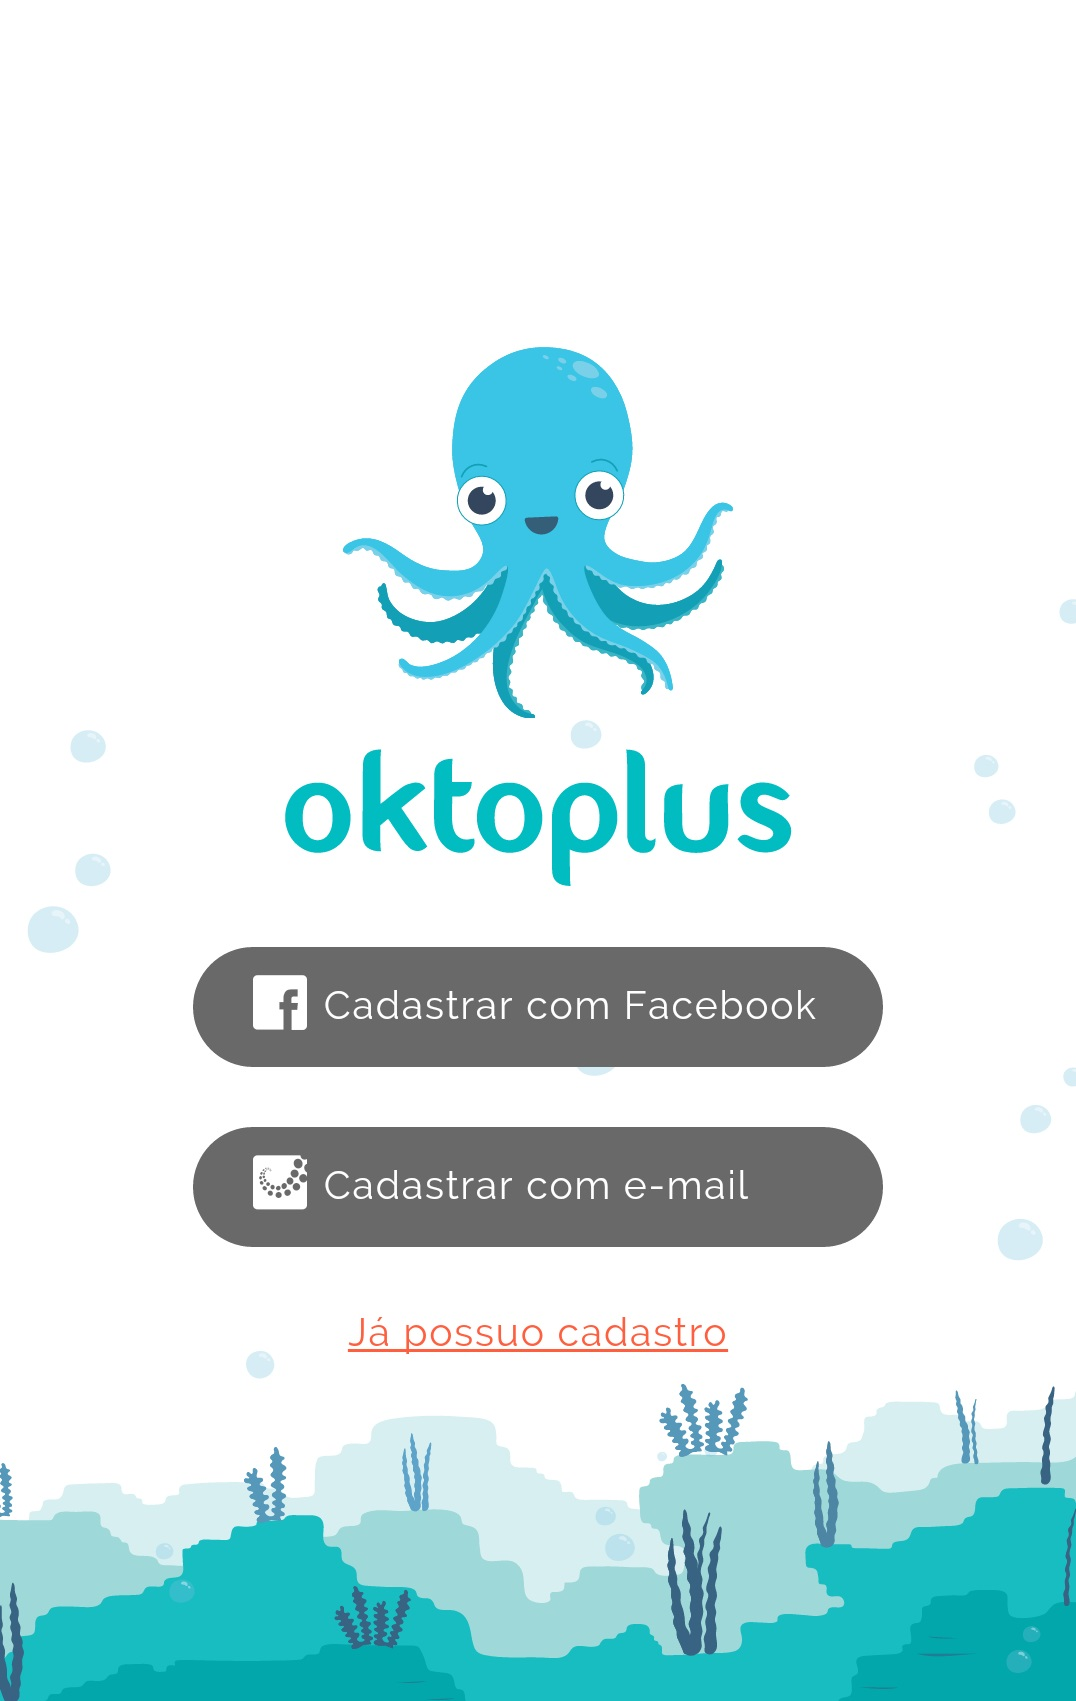 cadastro-app-oktoplus-1